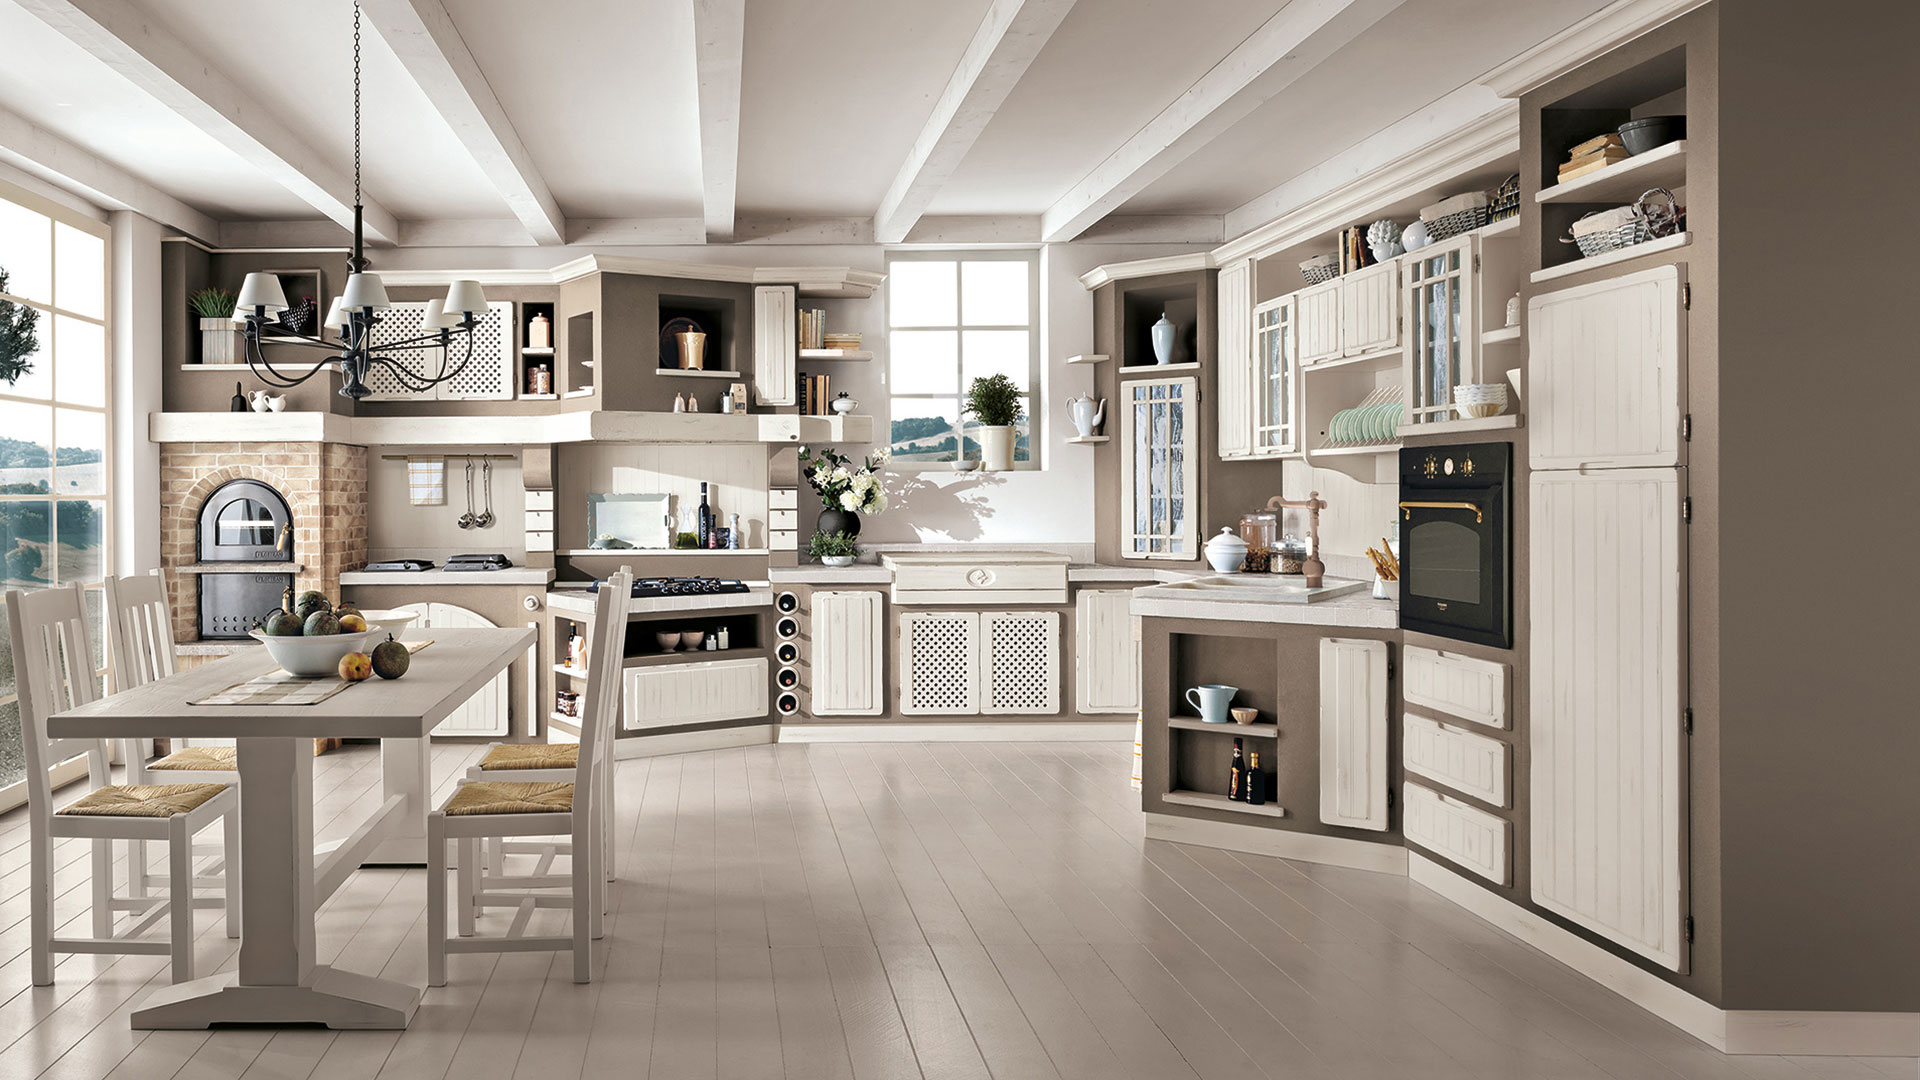 Cucina Bianca Moderna Con Tavolo Antico.Elena Cucine Borgo Antico Cucine Lube